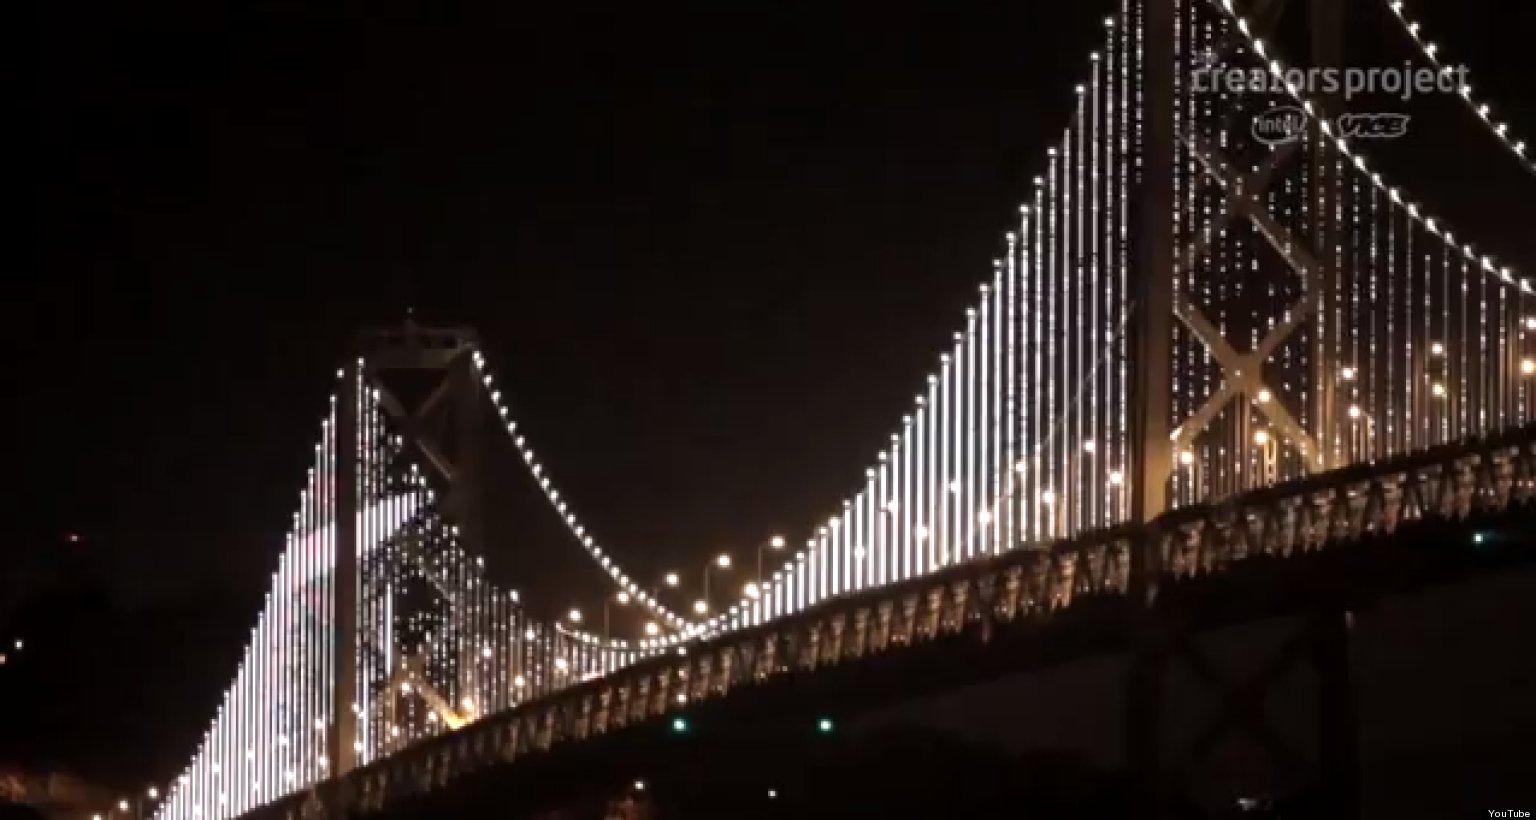 The Bay Lights: 25,000 Leds Illuminate